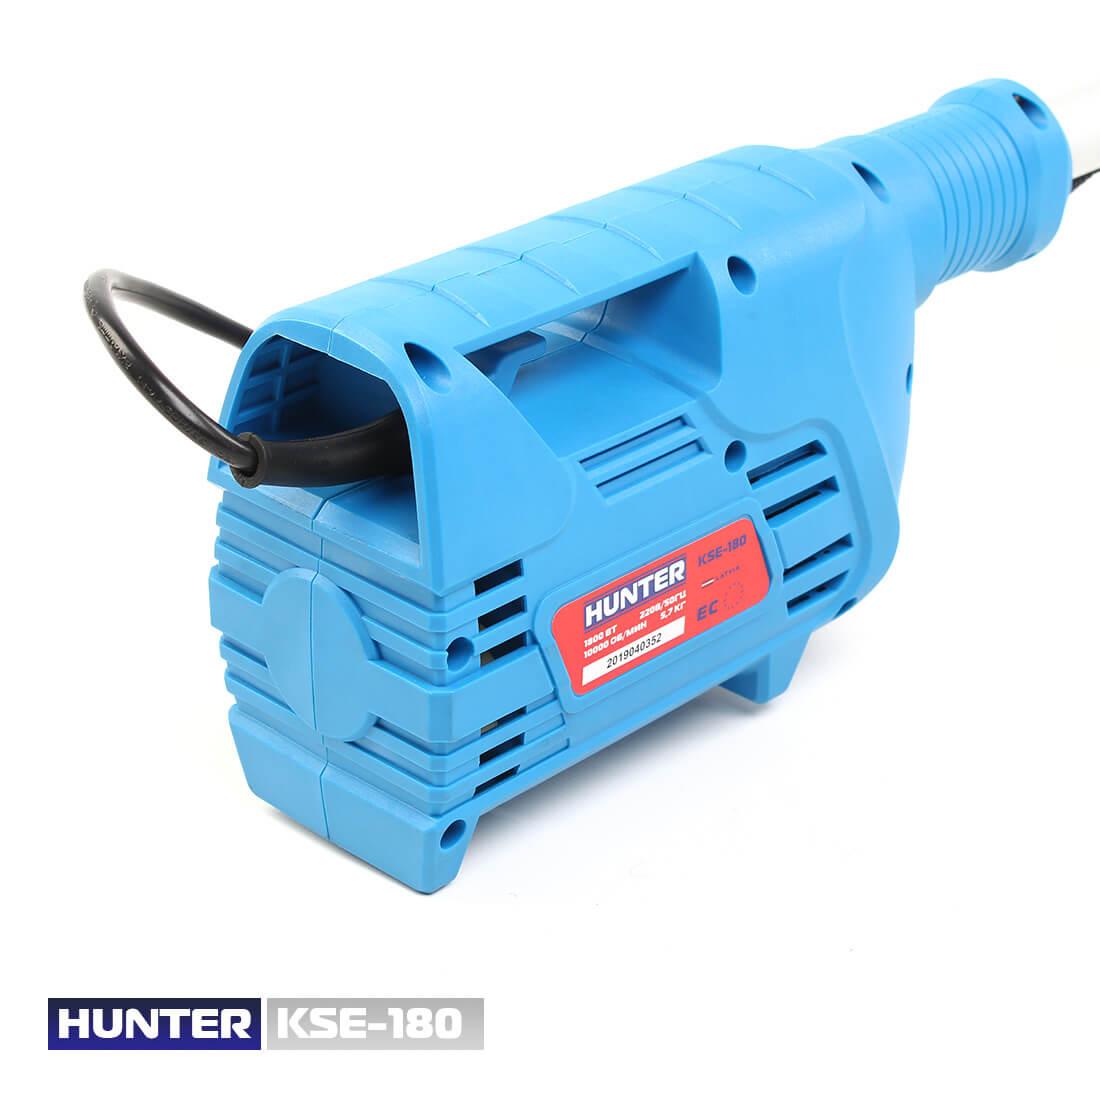 Фото Электрический триммер KSE-180 цена 2300грн №5 — Hunter